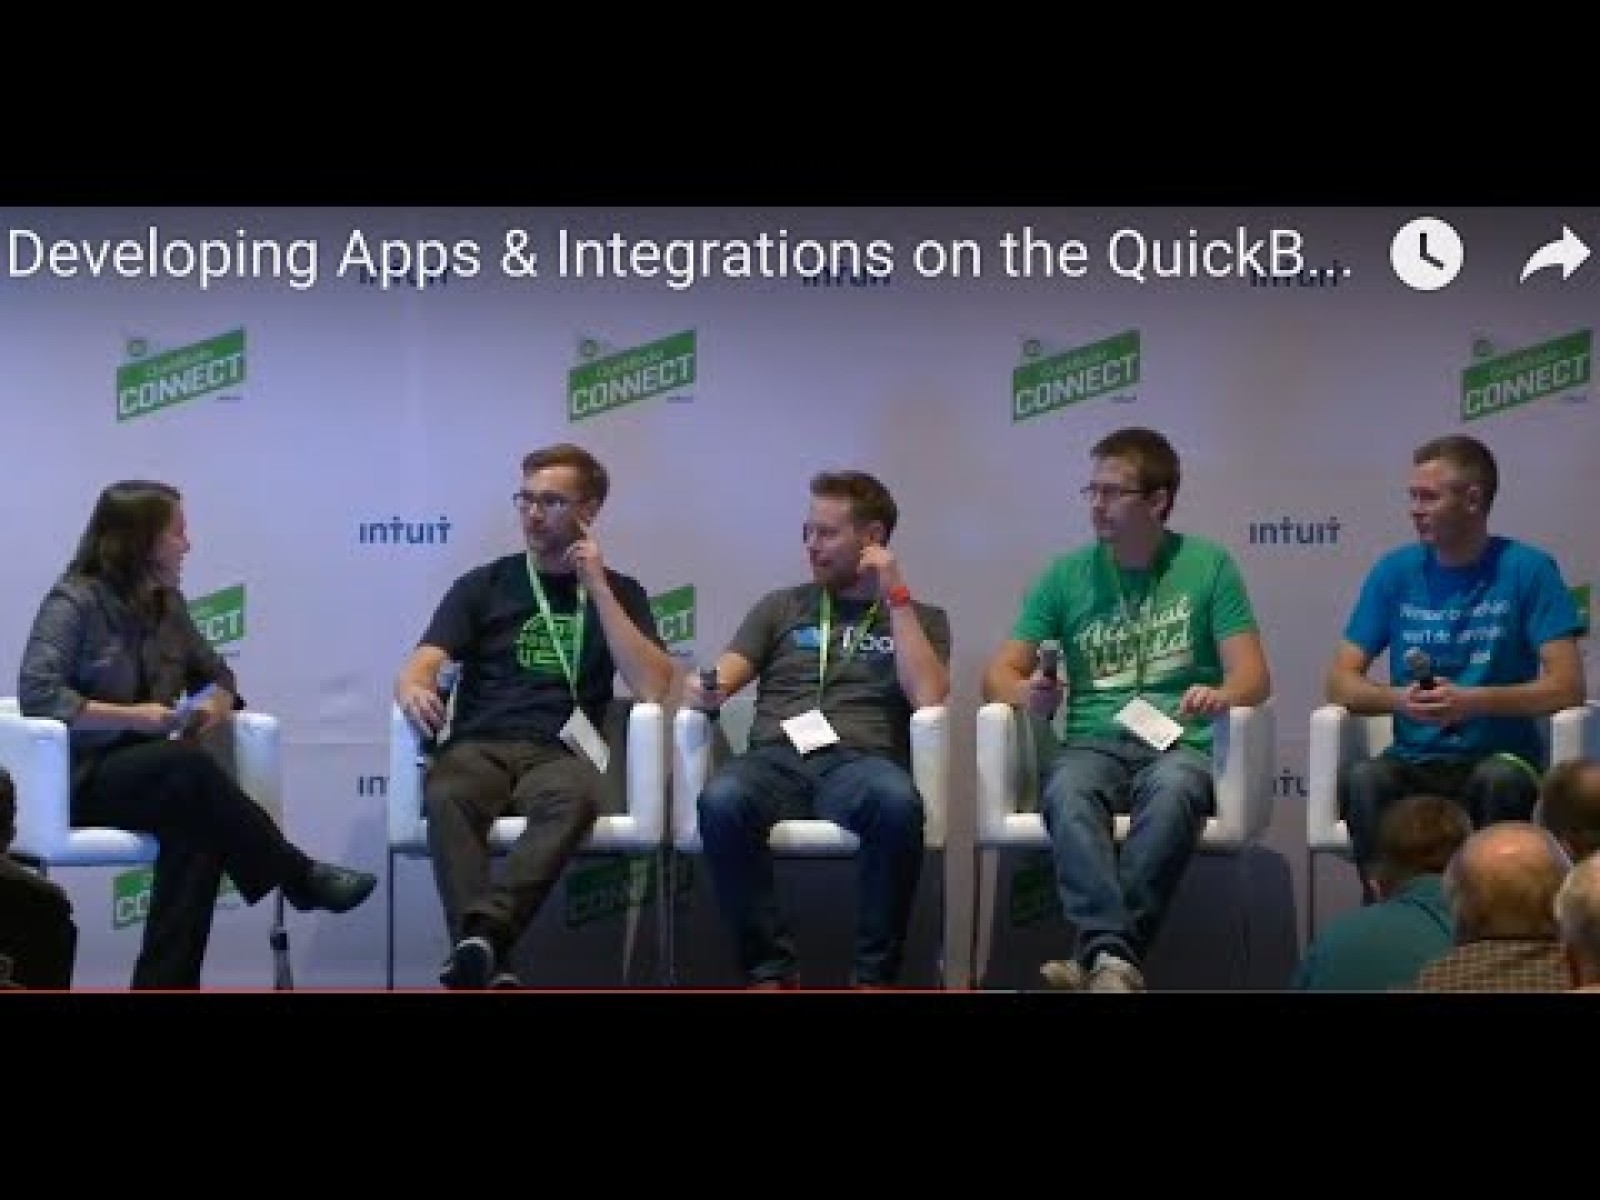 Developing Apps & Integrations on the QuickBooks Platform: QuickBooks Connect 2015 Developer Session